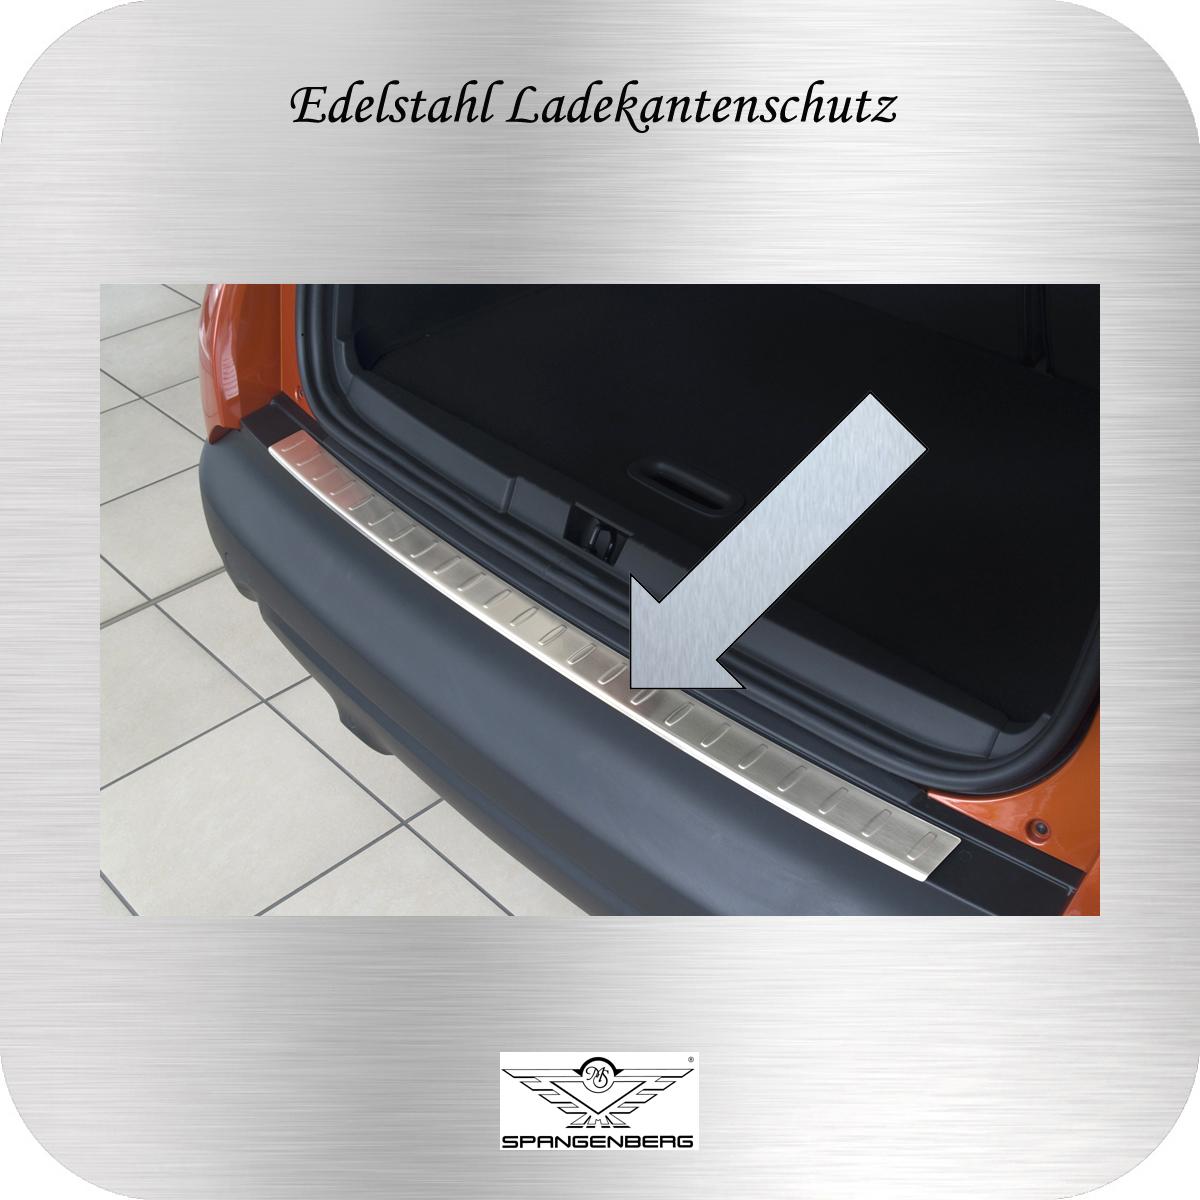 Ladekantenschutz Edelstahl Renault Captur Minisuv 2013- 3235709